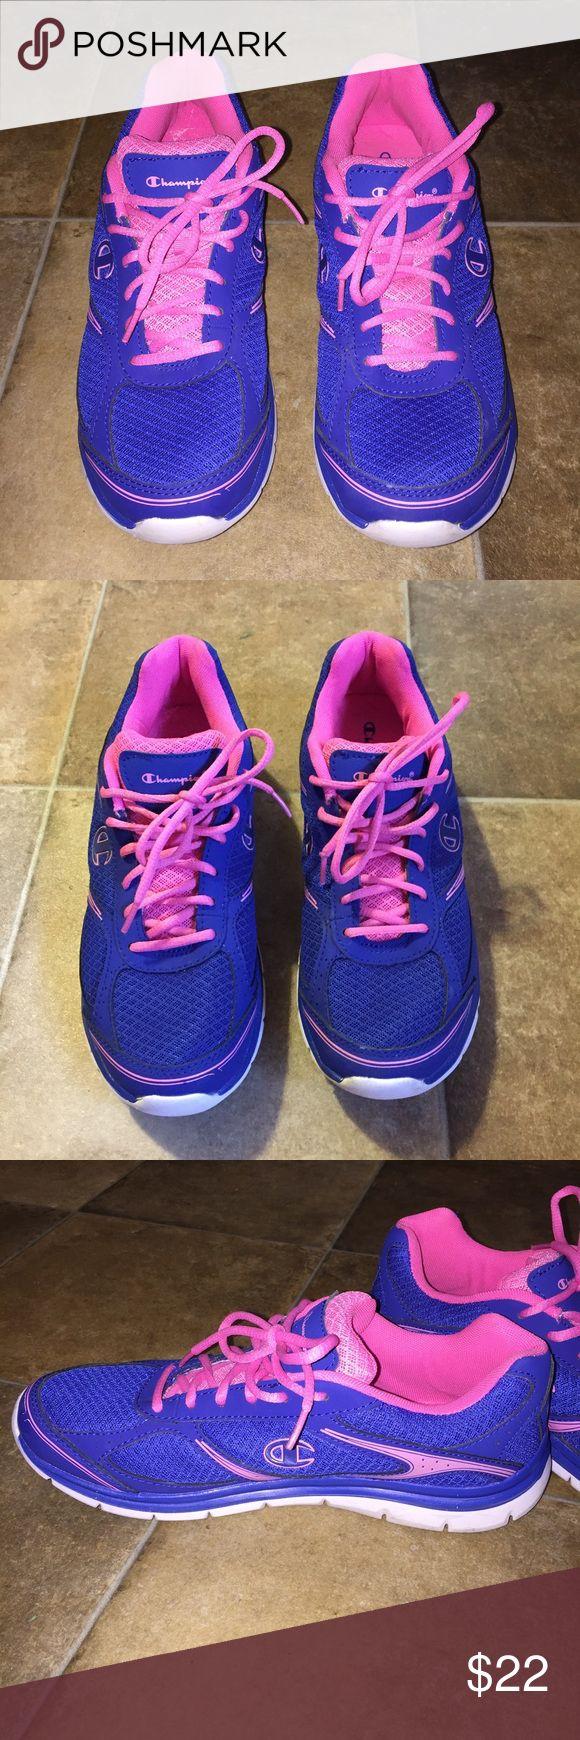 25 best ideas about purple tennis shoes on